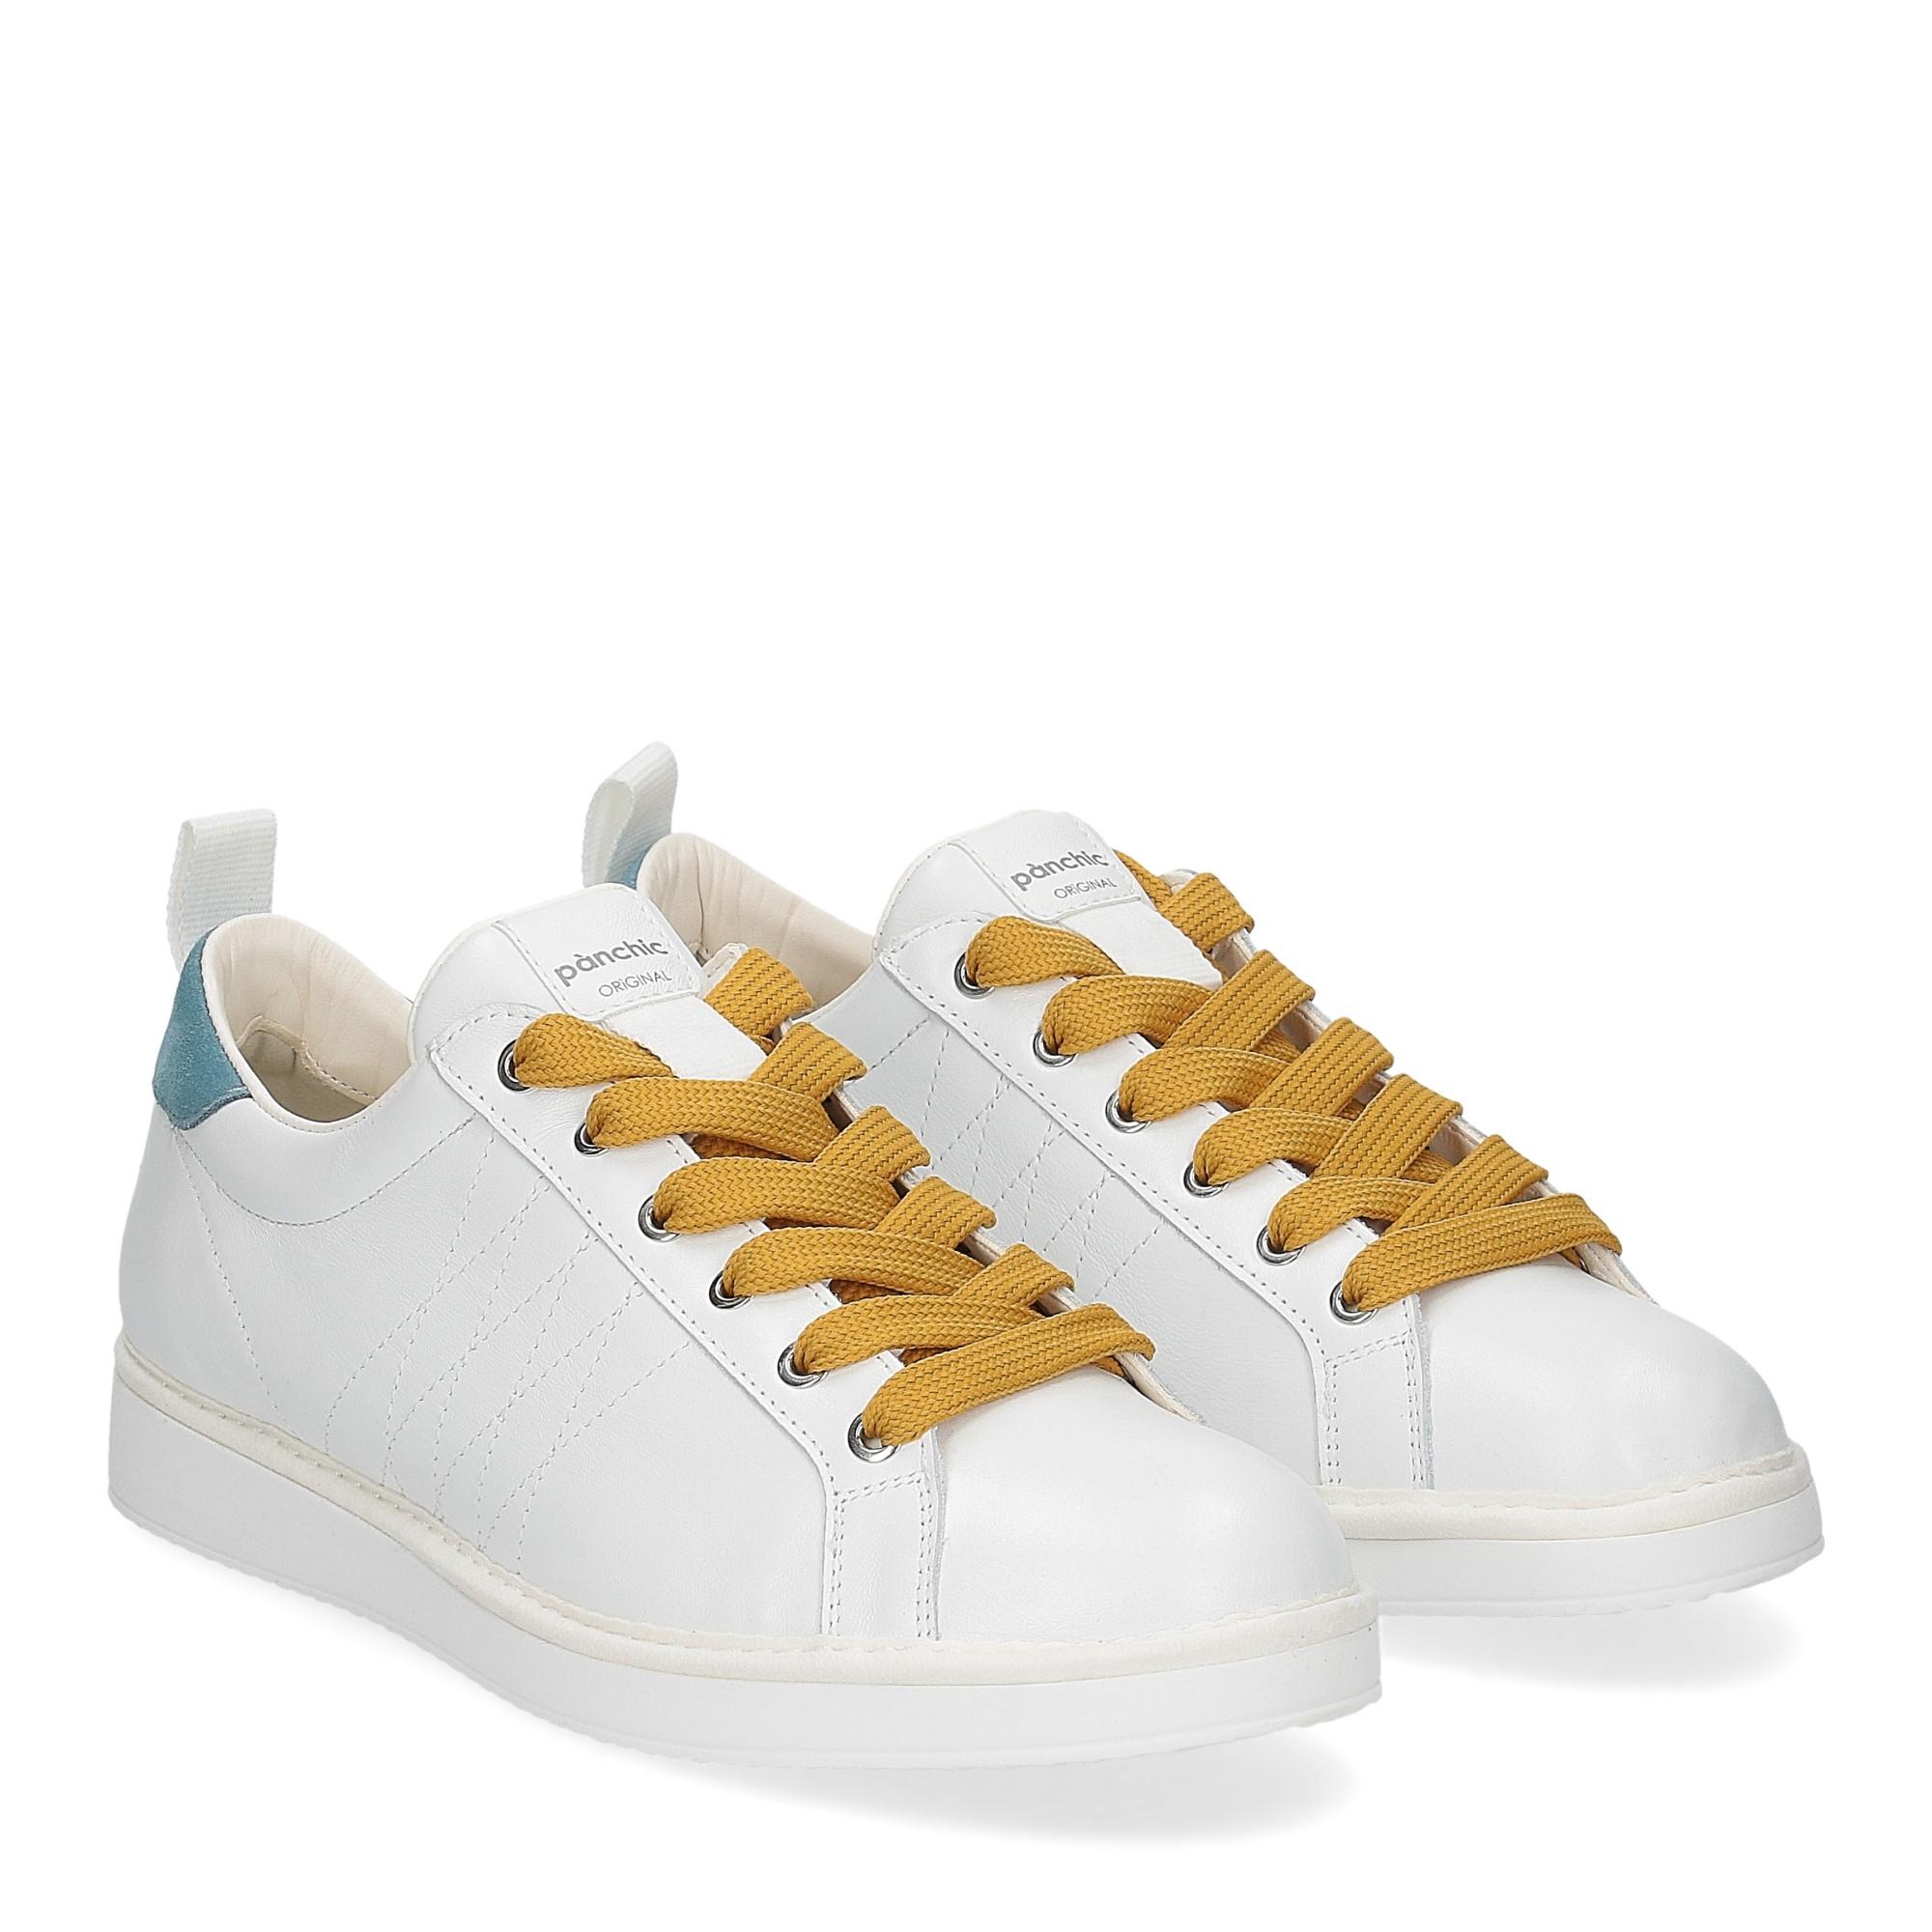 Panchic P01M leather white niagara soleil